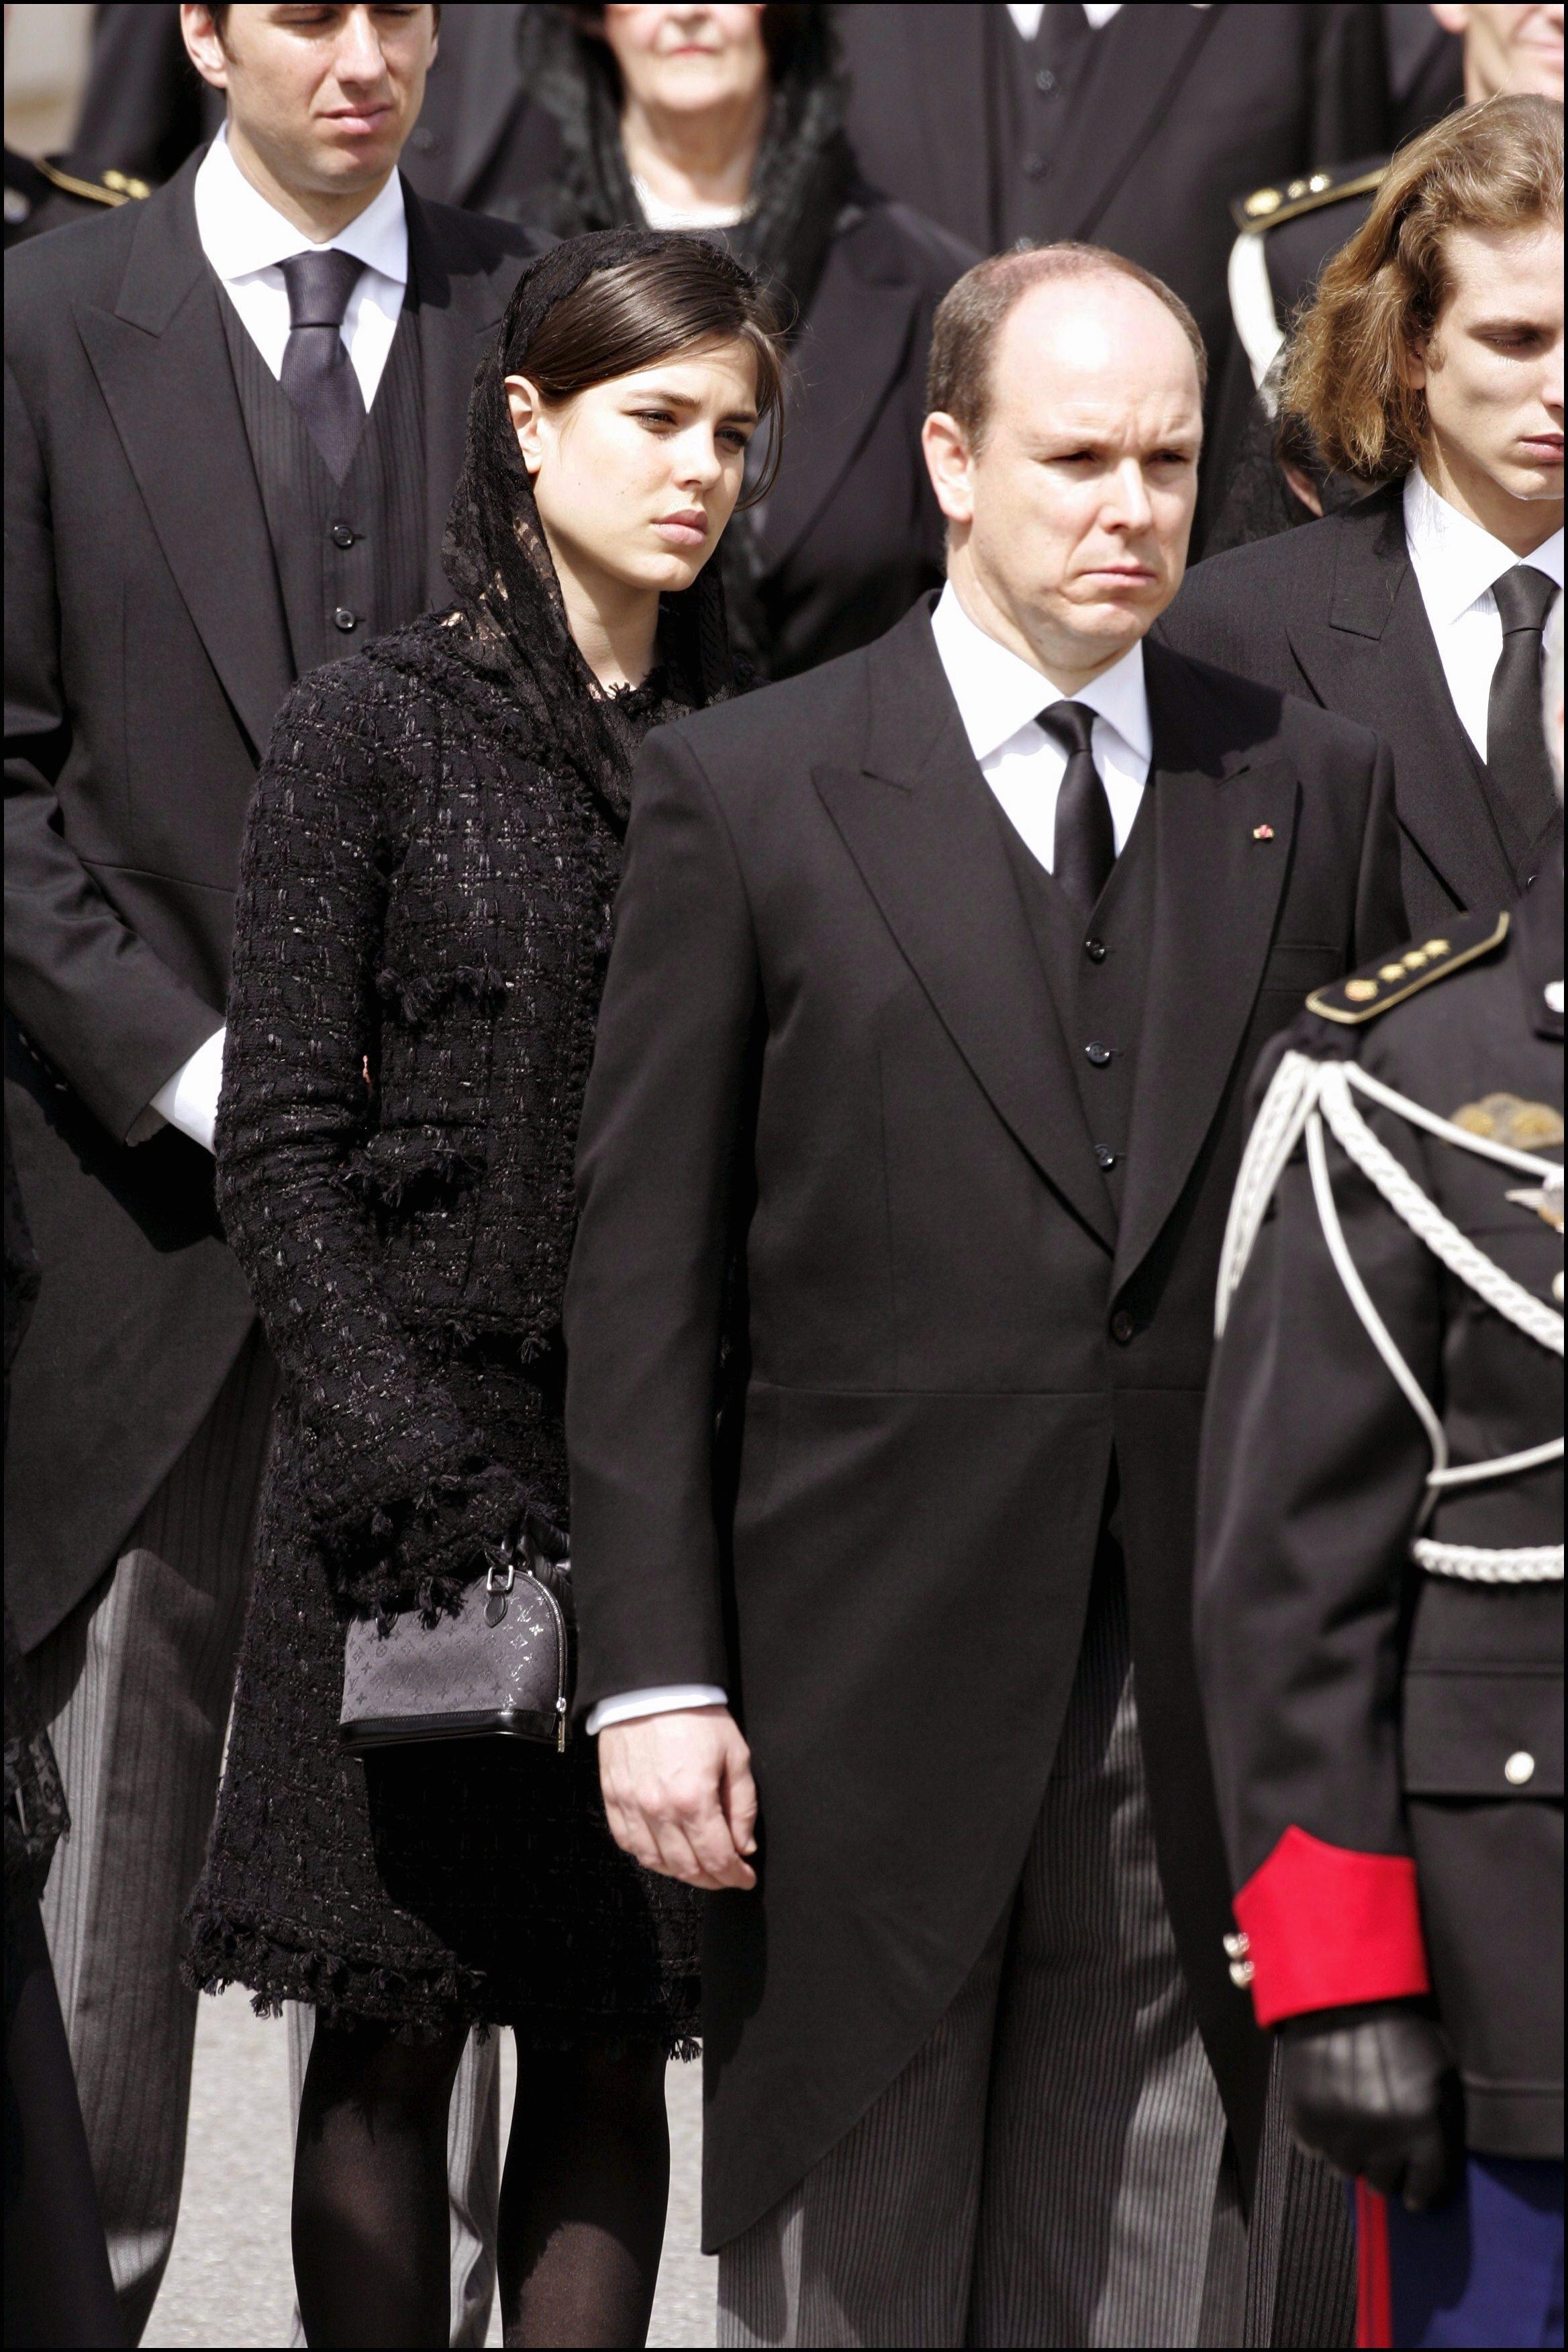 Funeral Of Prince Rainier Iii Of Monaco In Monaco City, Monaco On April 15, 2005.